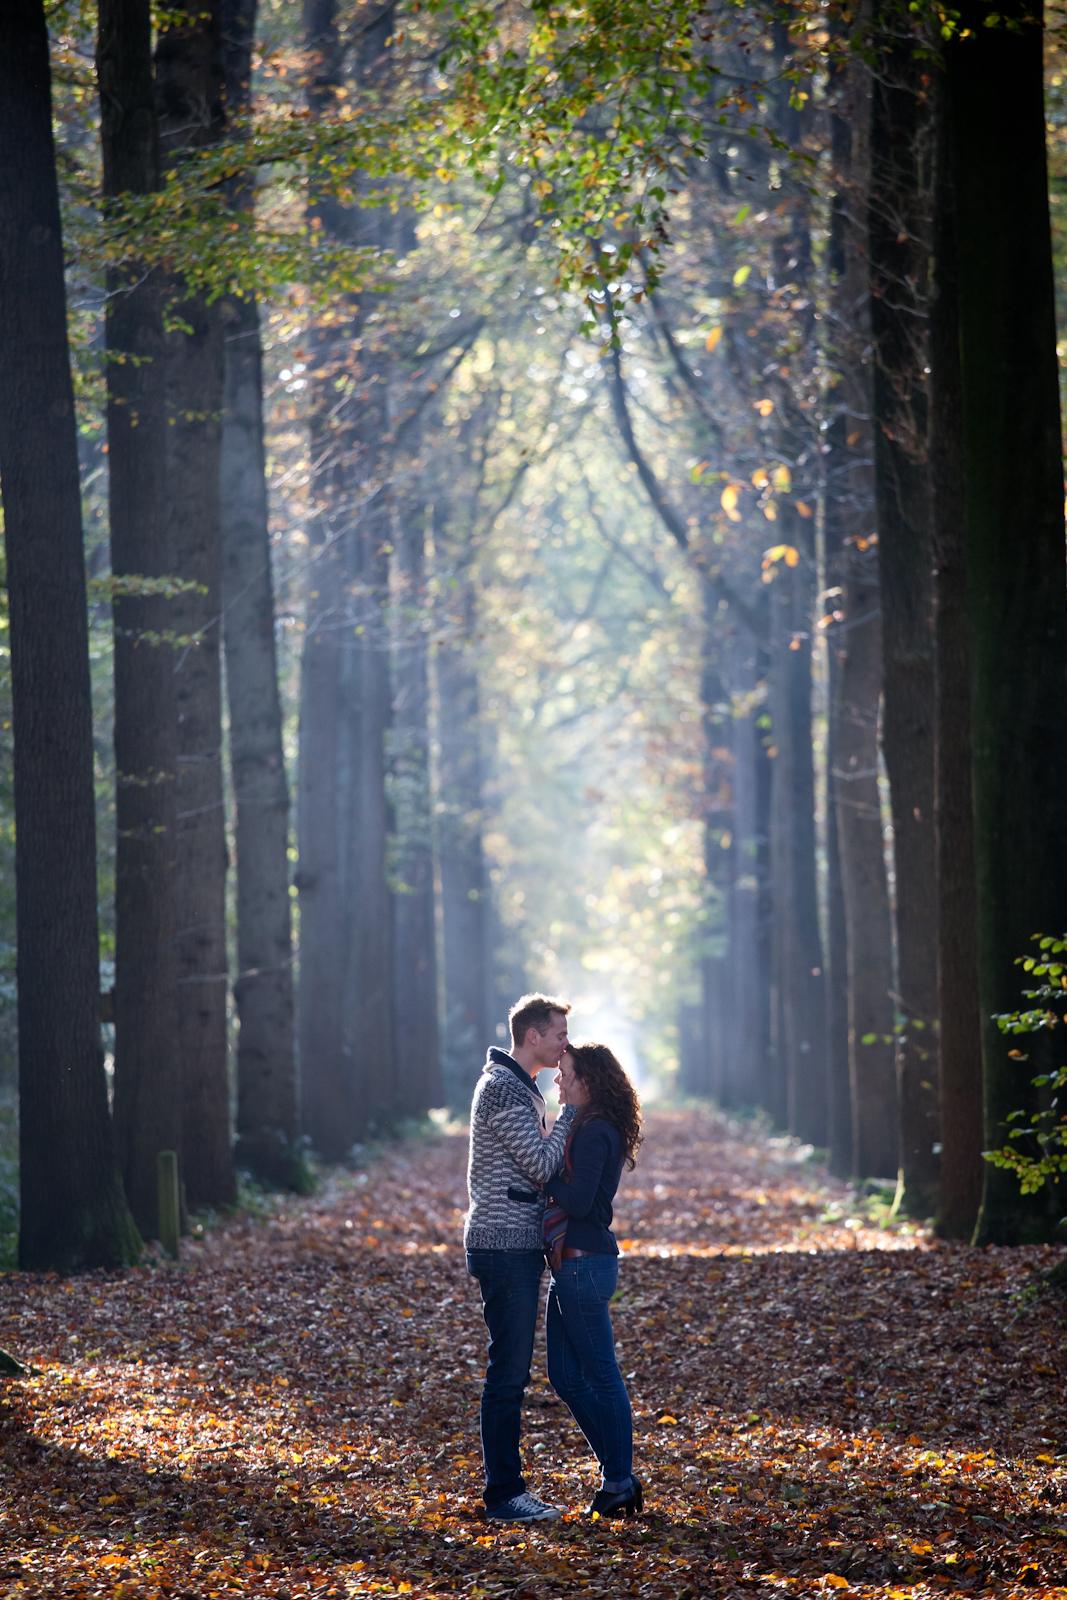 Julie & Jordy, engaged by Kelly Steenlandt